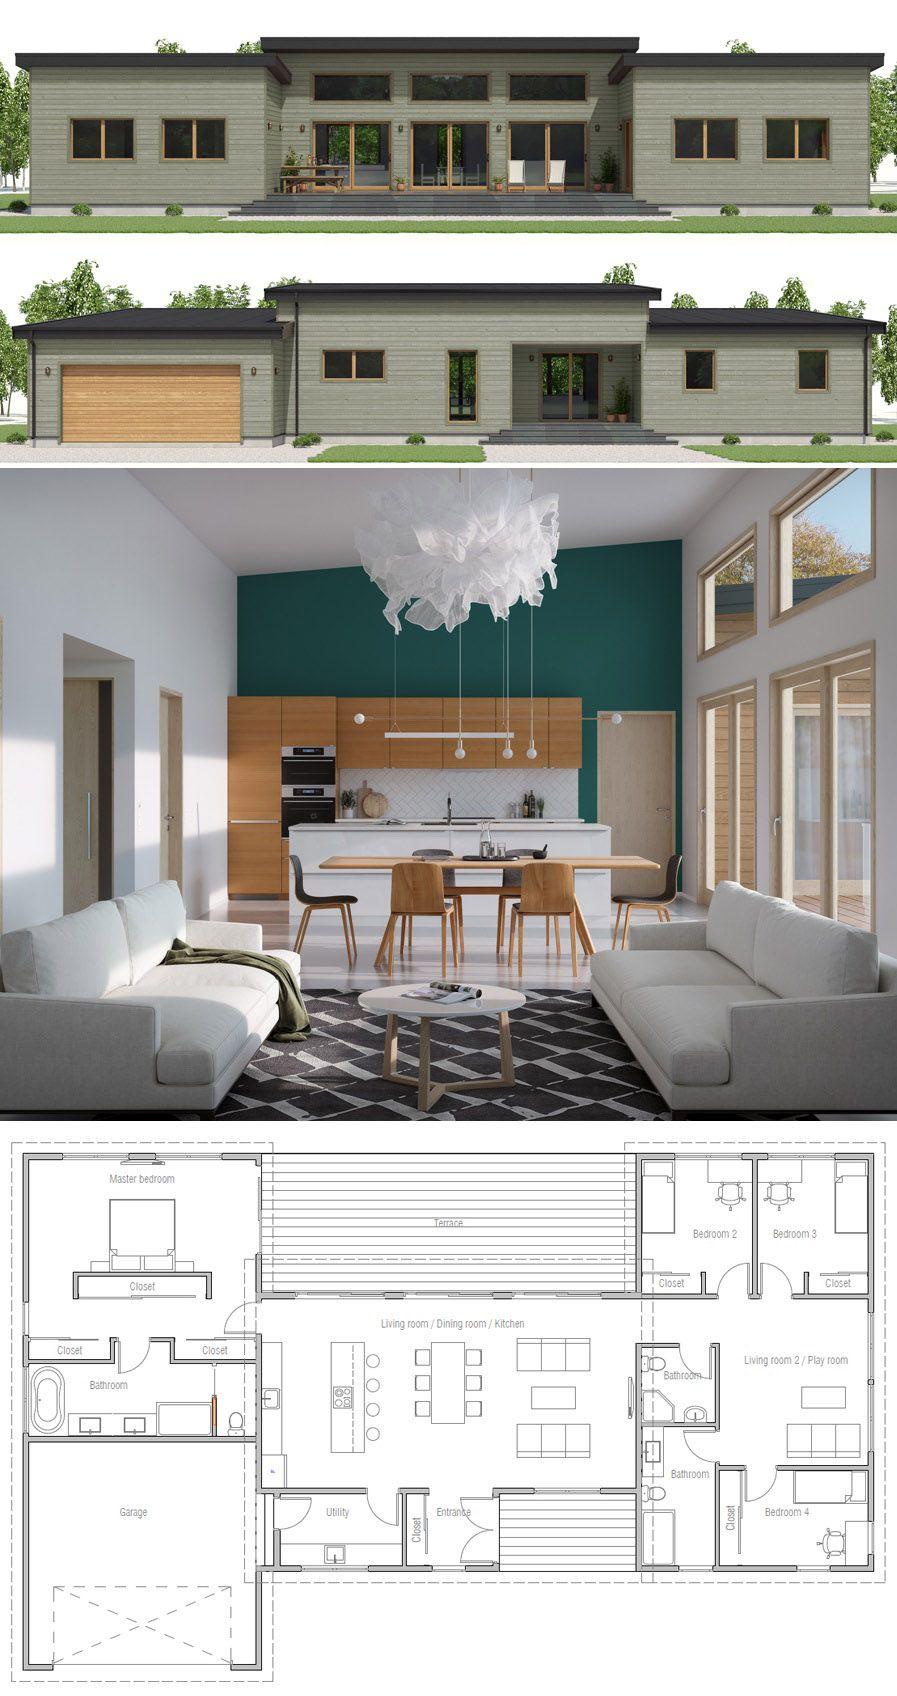 House plans home floor new architecture designs homeplans houseplans floorplans housedesign interiordesign also rh pinterest